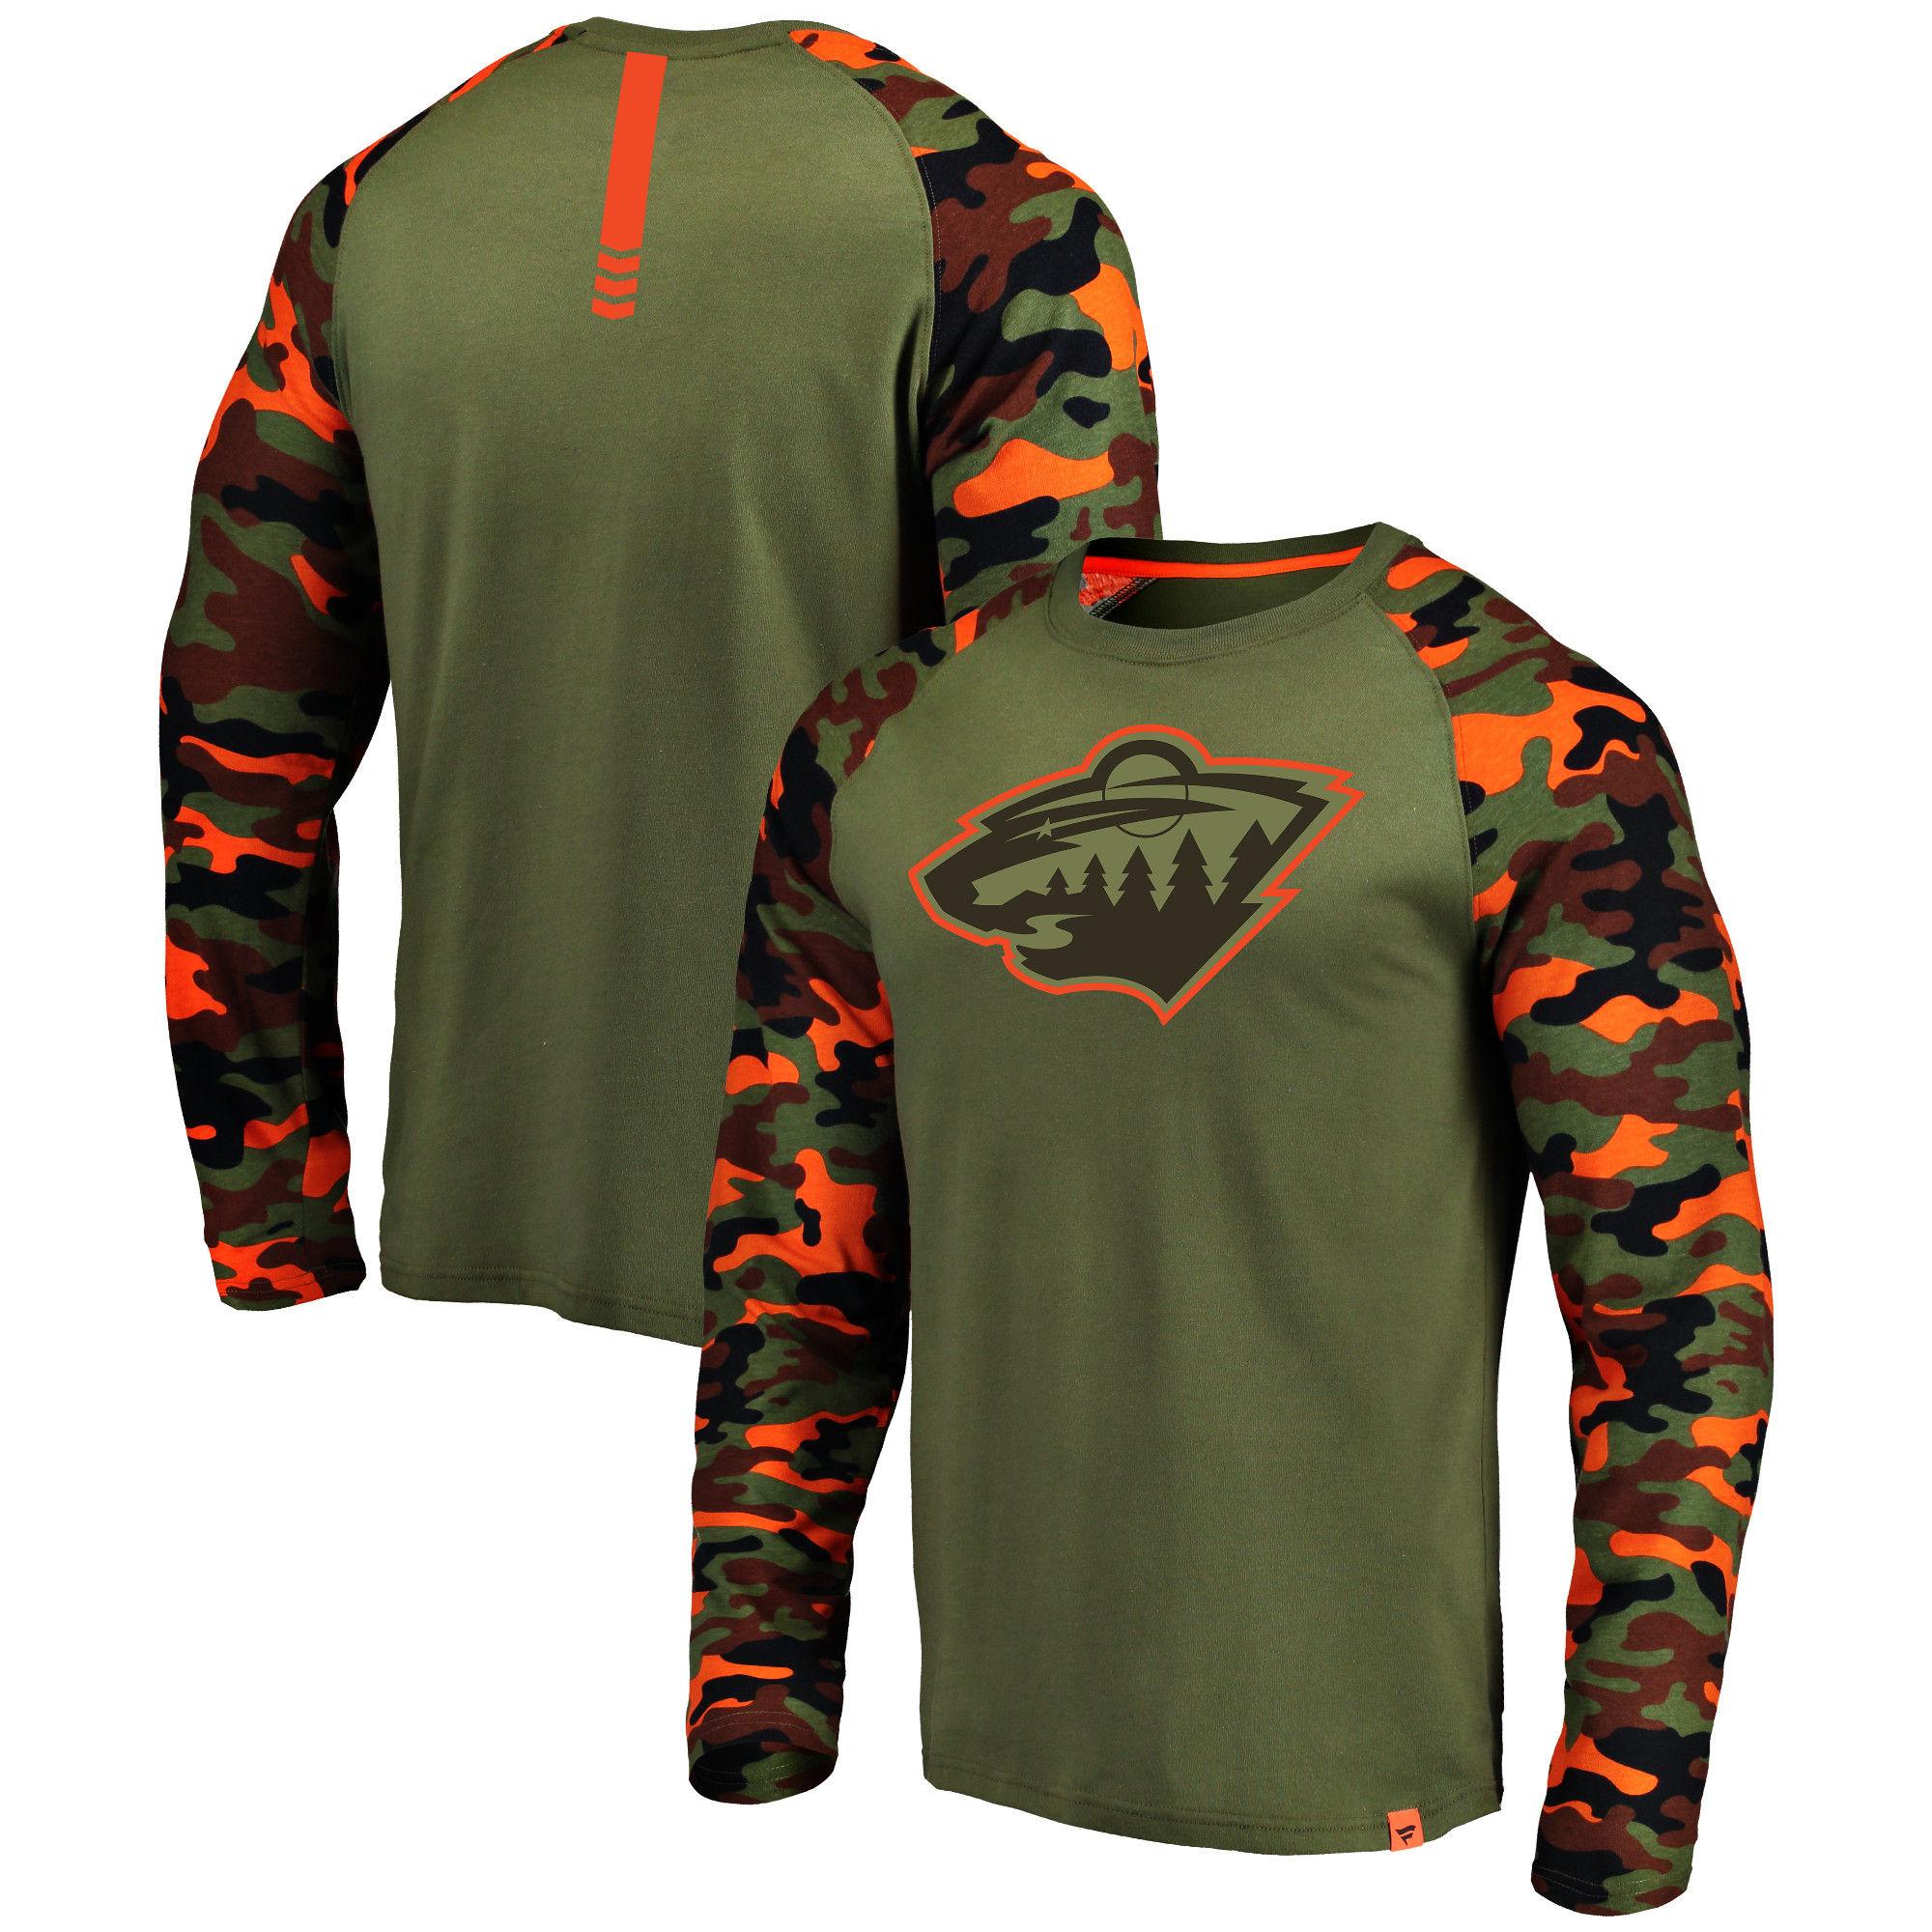 Minnesota Wild Fanatics Branded Olive/Camo Recon Long Sleeve Raglan T-Shirt